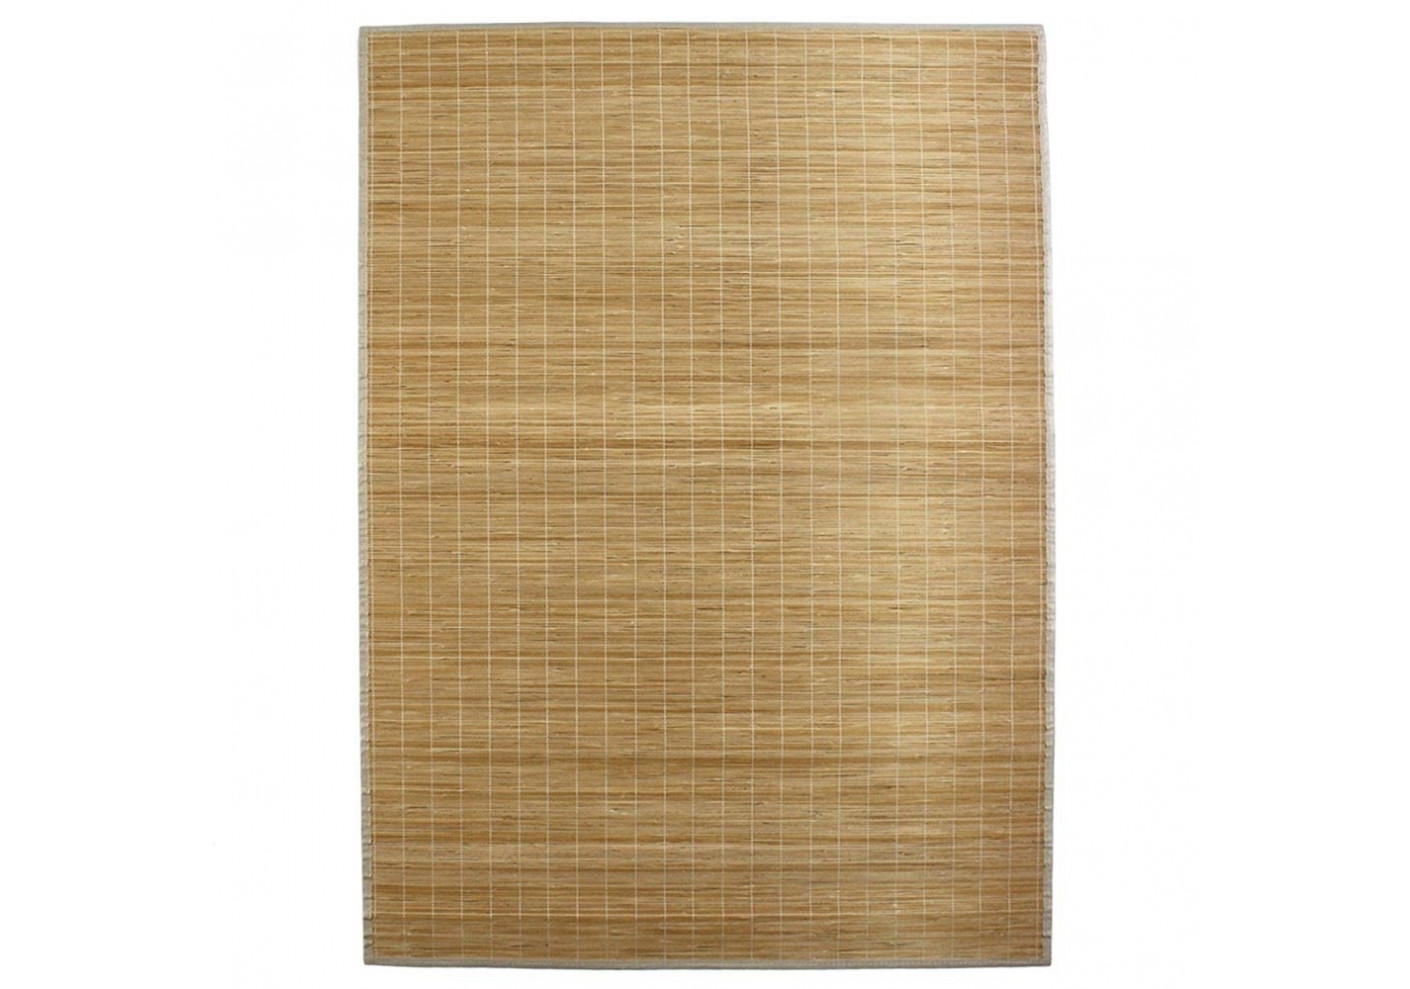 tapis en bambou fines lattes et ganse naturel l120 p170 tapis salon. Black Bedroom Furniture Sets. Home Design Ideas